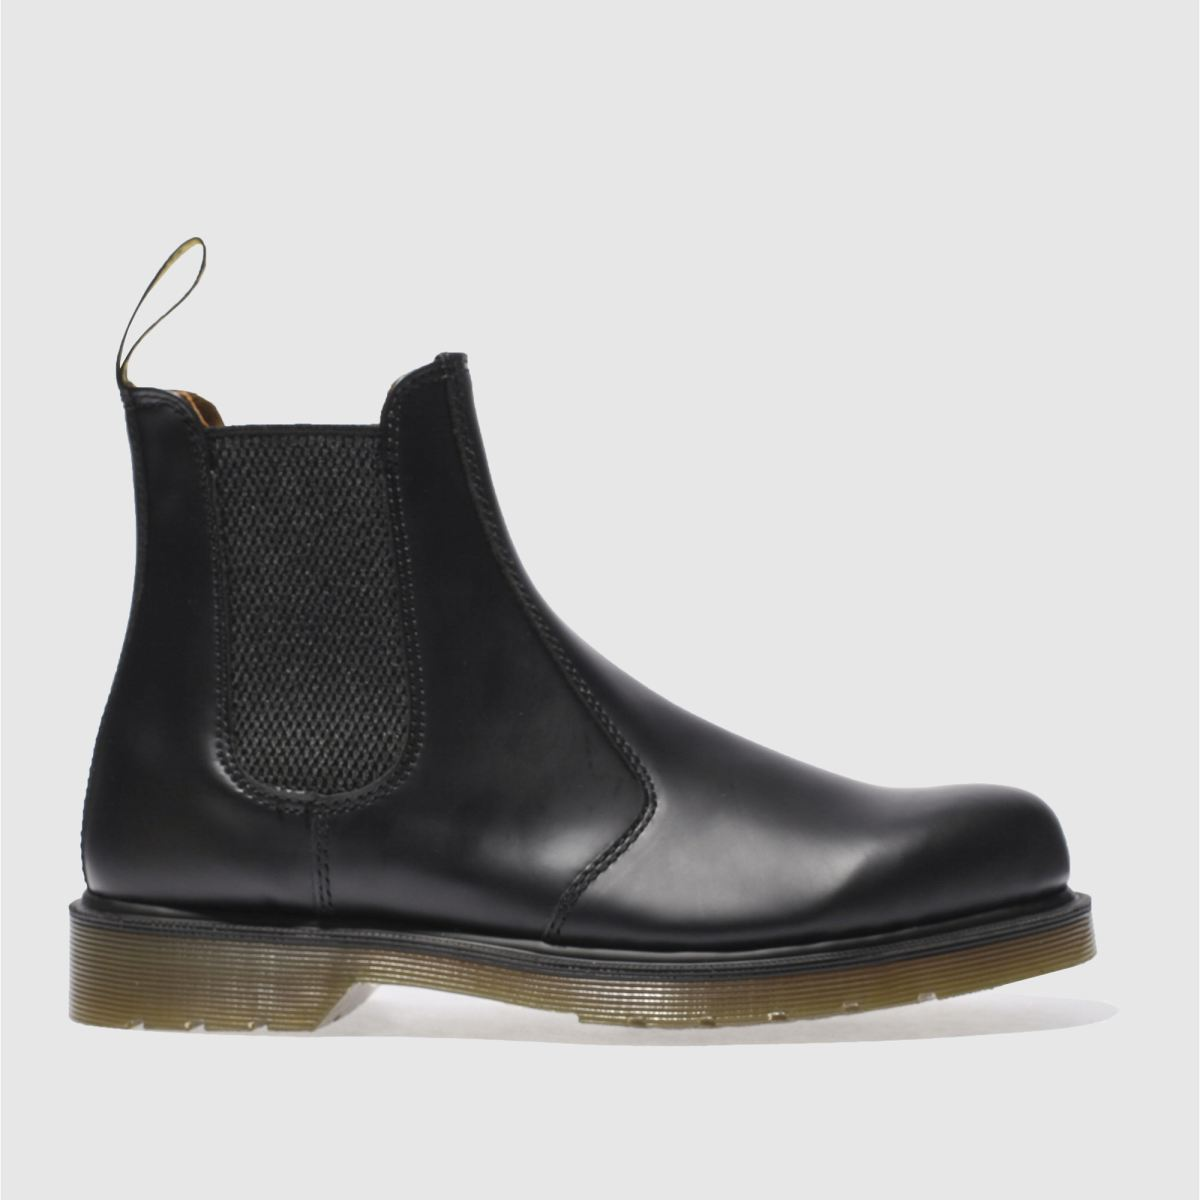 Dr Martens Black Original Chelsea Boots